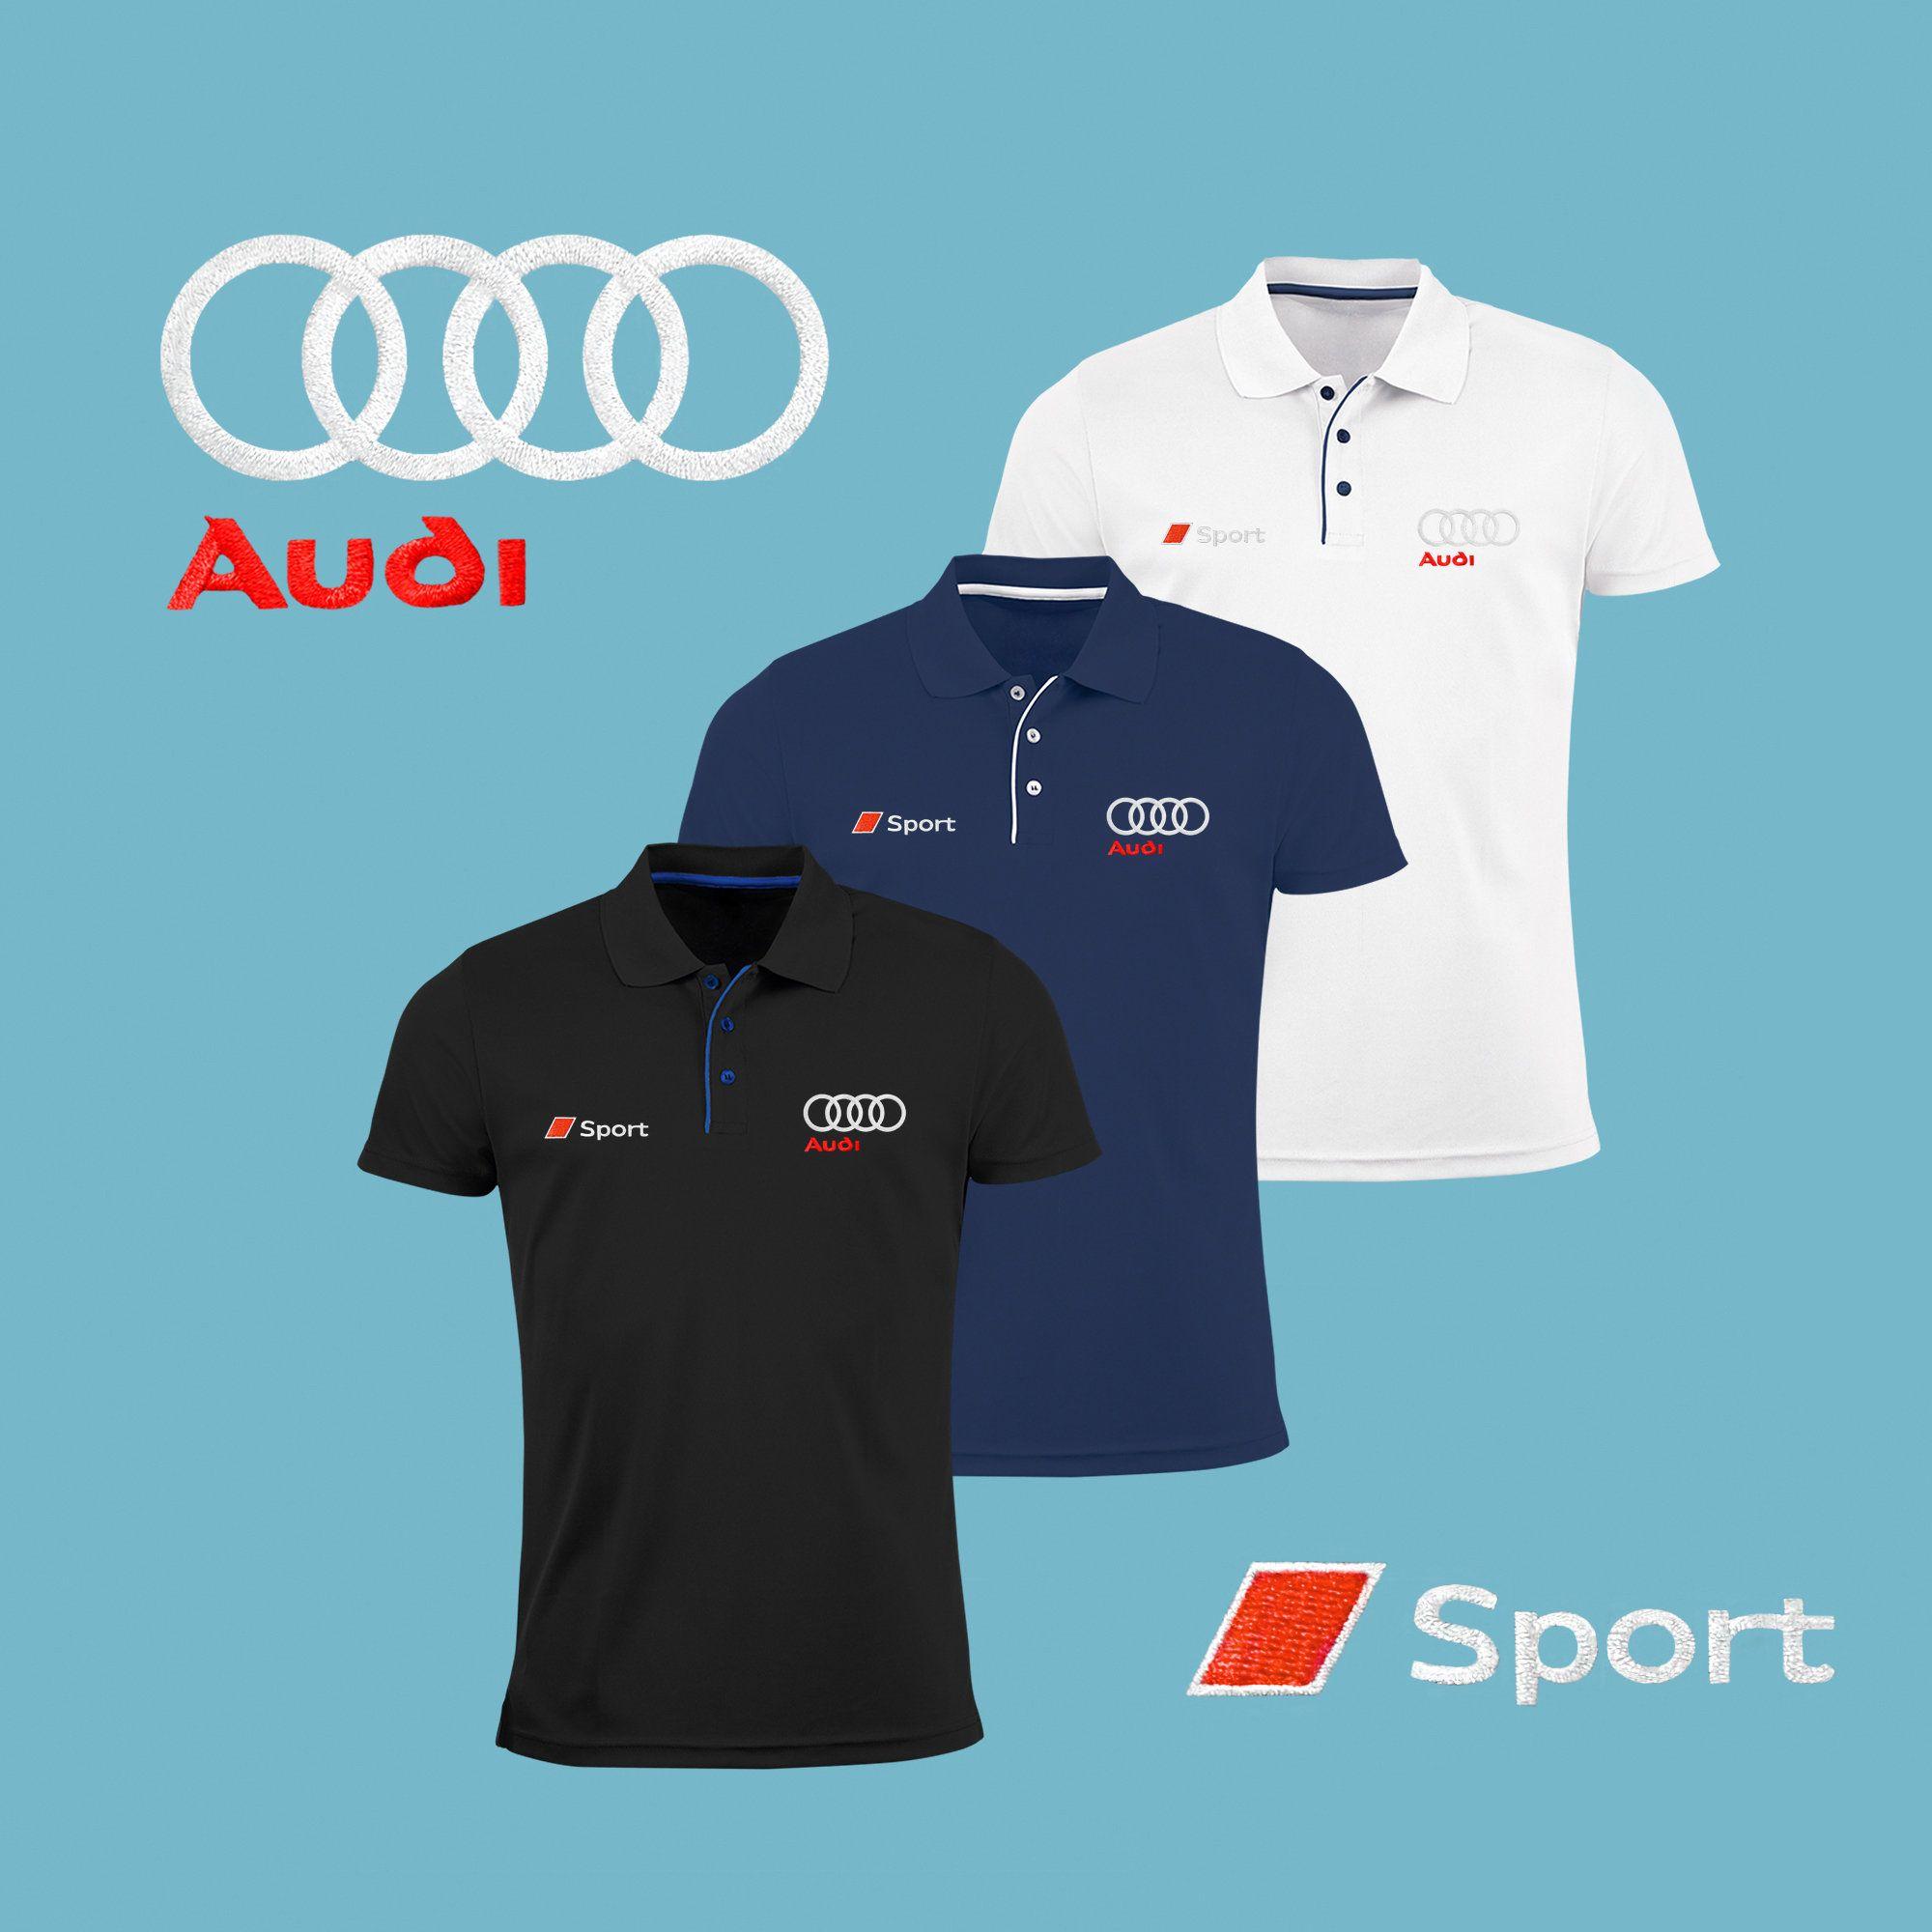 ddd613bfe Audi Sport Polo Shirt EMBROIDERED #mensfashion #menswear #menstyle  #mensfashion_guide #tshirt #poloshirt #embroidery #autologo #giftideas  #gifts ...